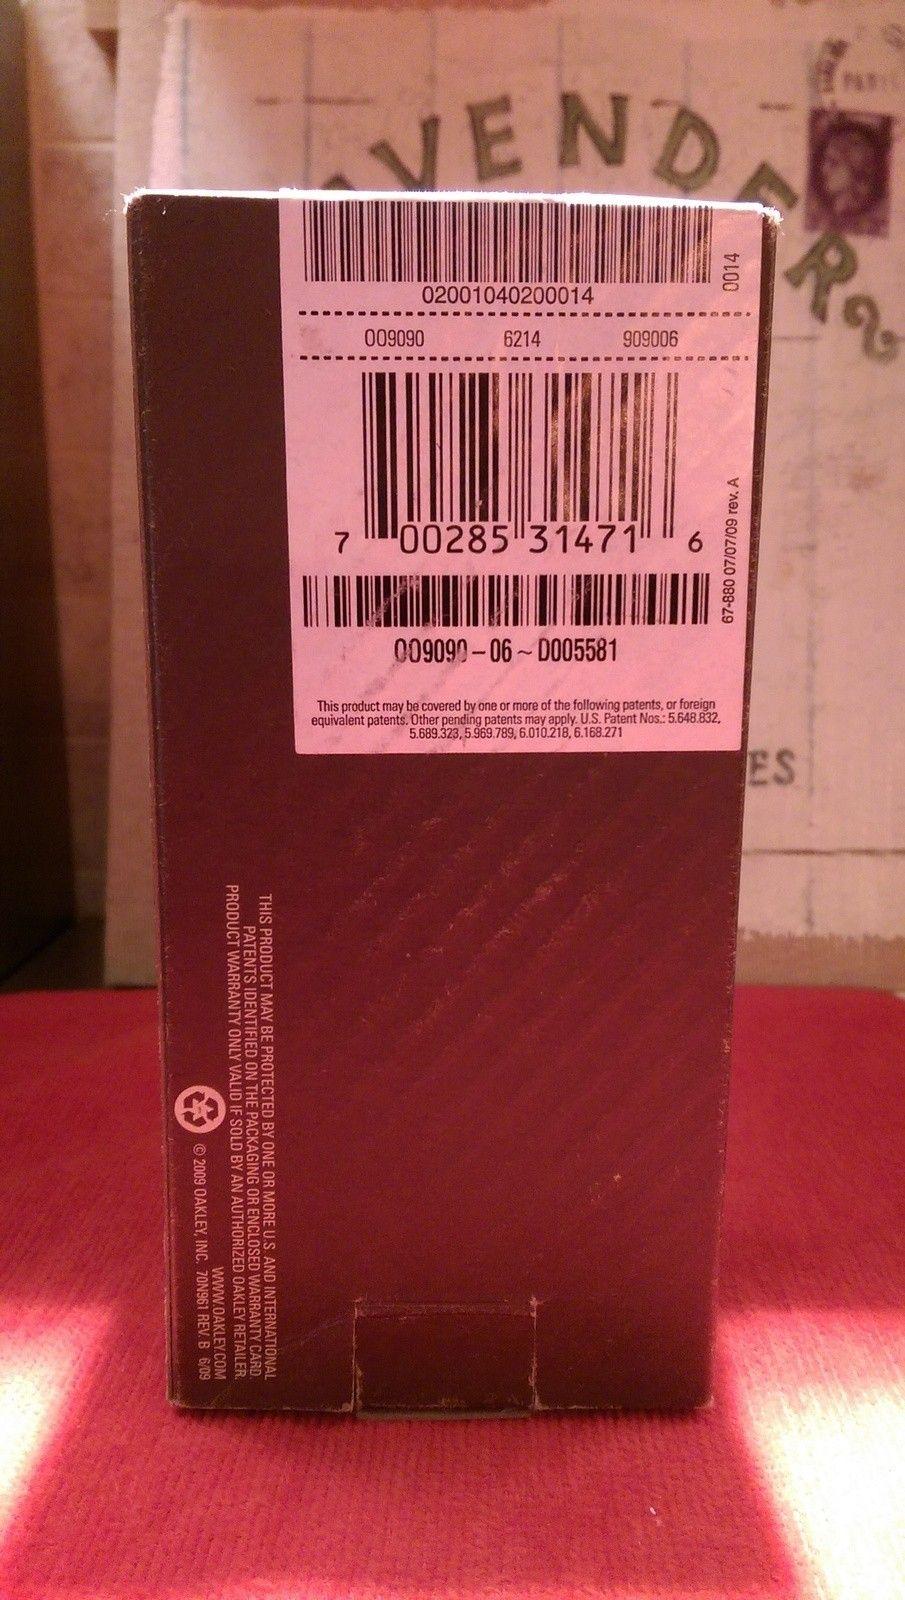 Oakley Dispatch 1 Clementine /Greyoo9090-06 BNIB - IMAG4829.jpg